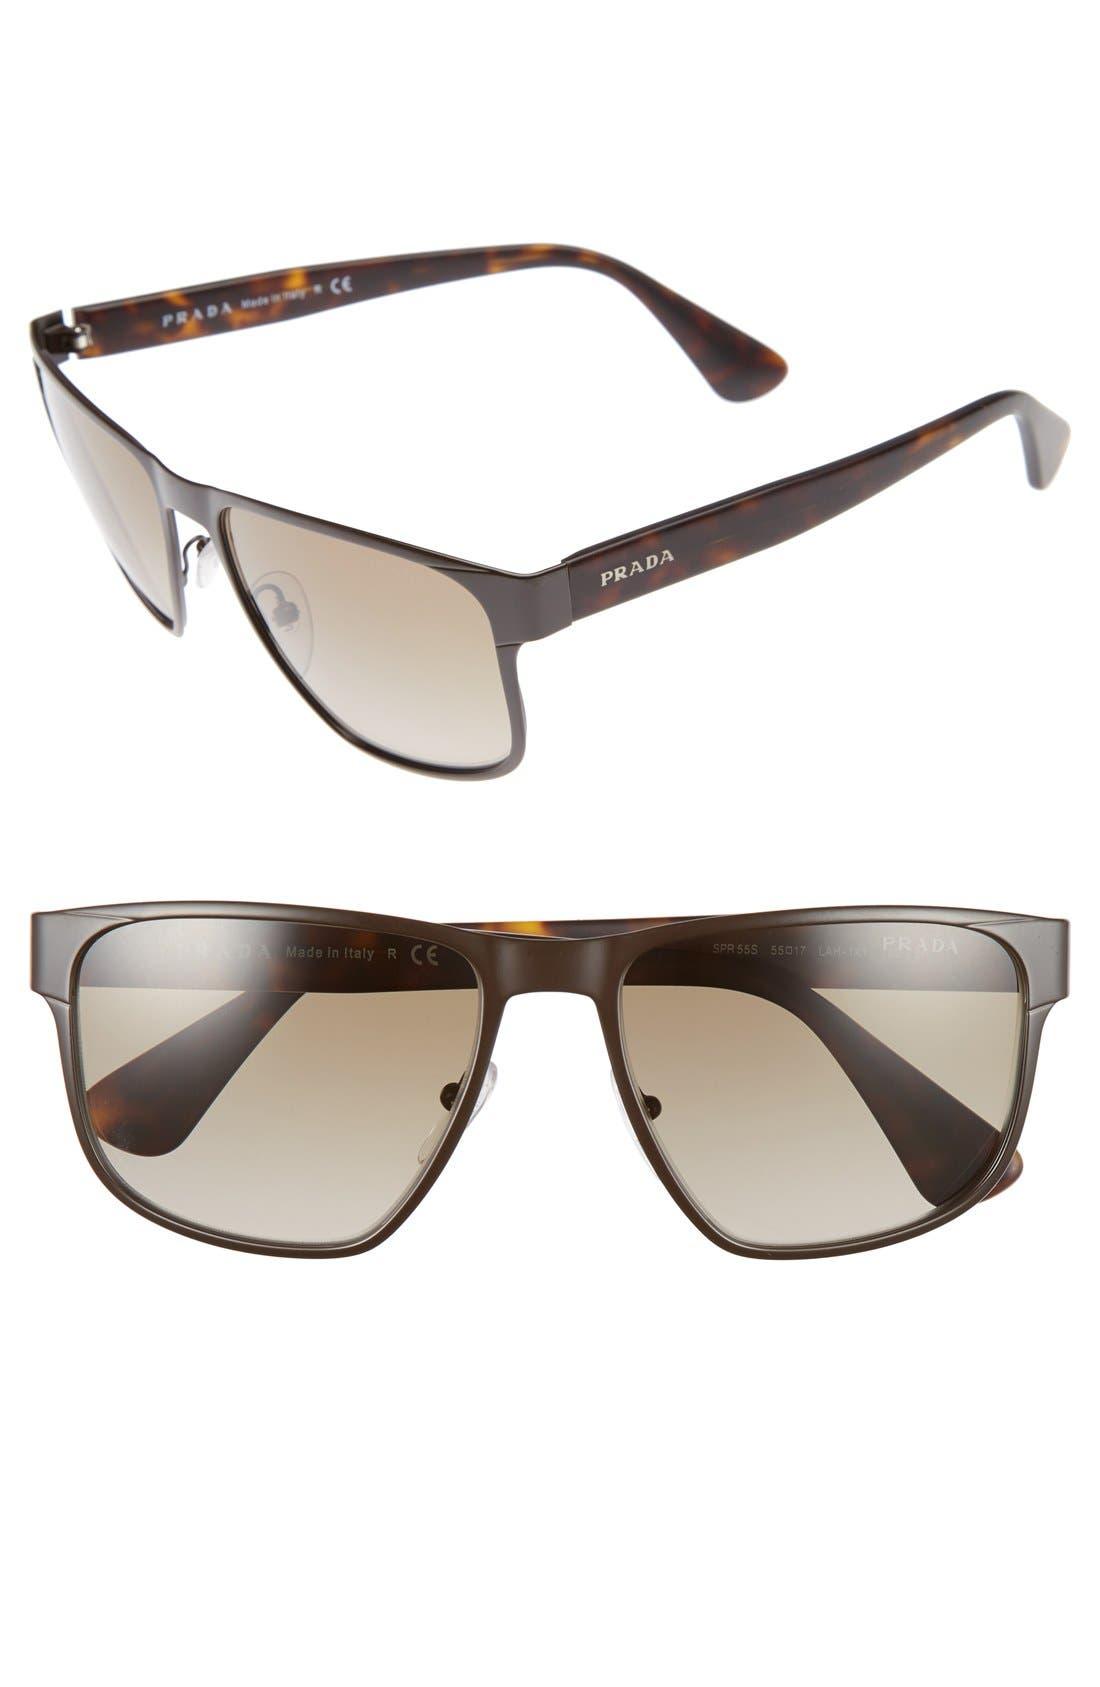 Prada 55mm Sunglasses